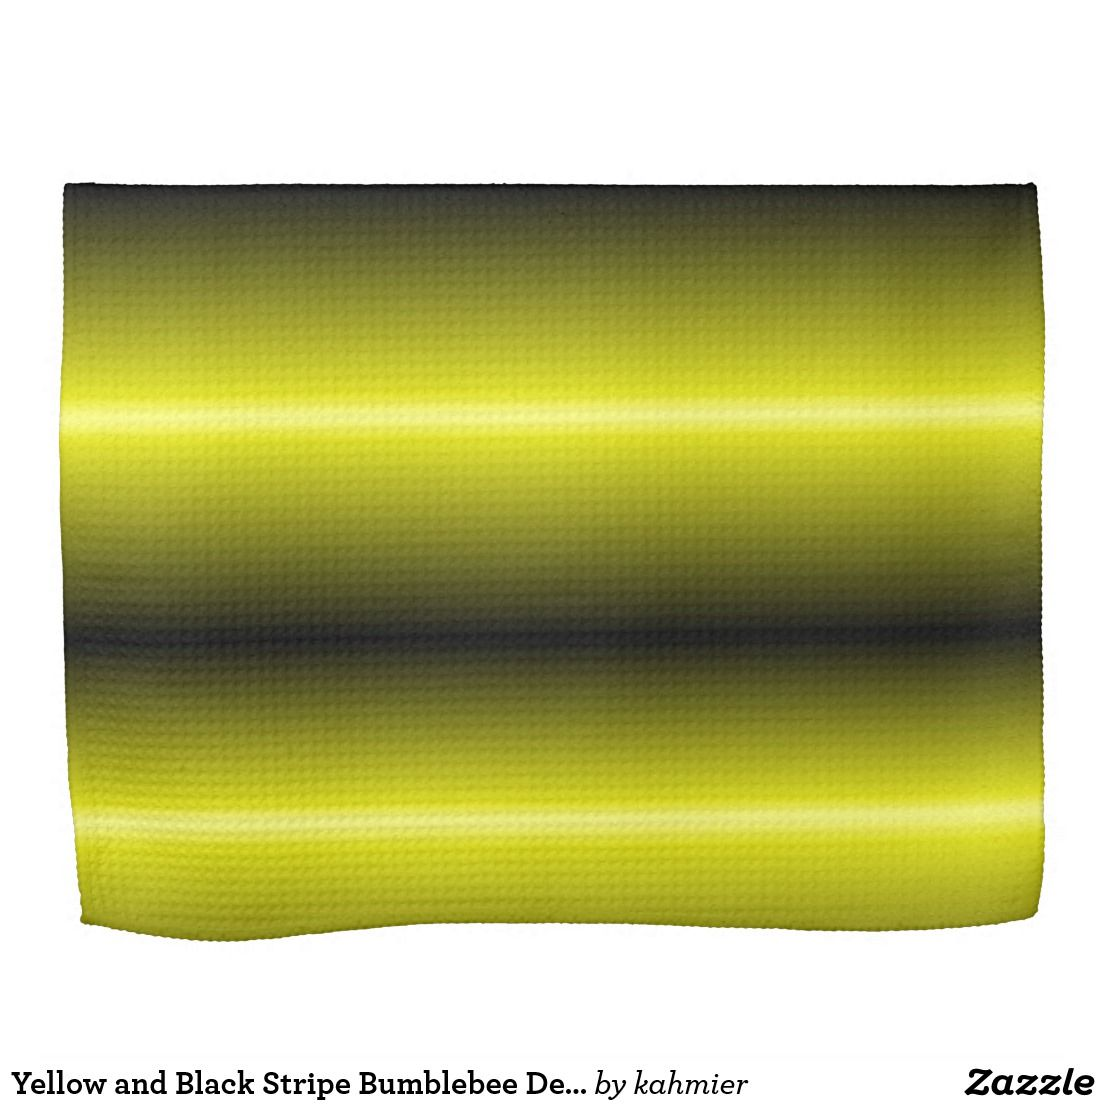 Yellow and Black Stripe Bumblebee Design Towel